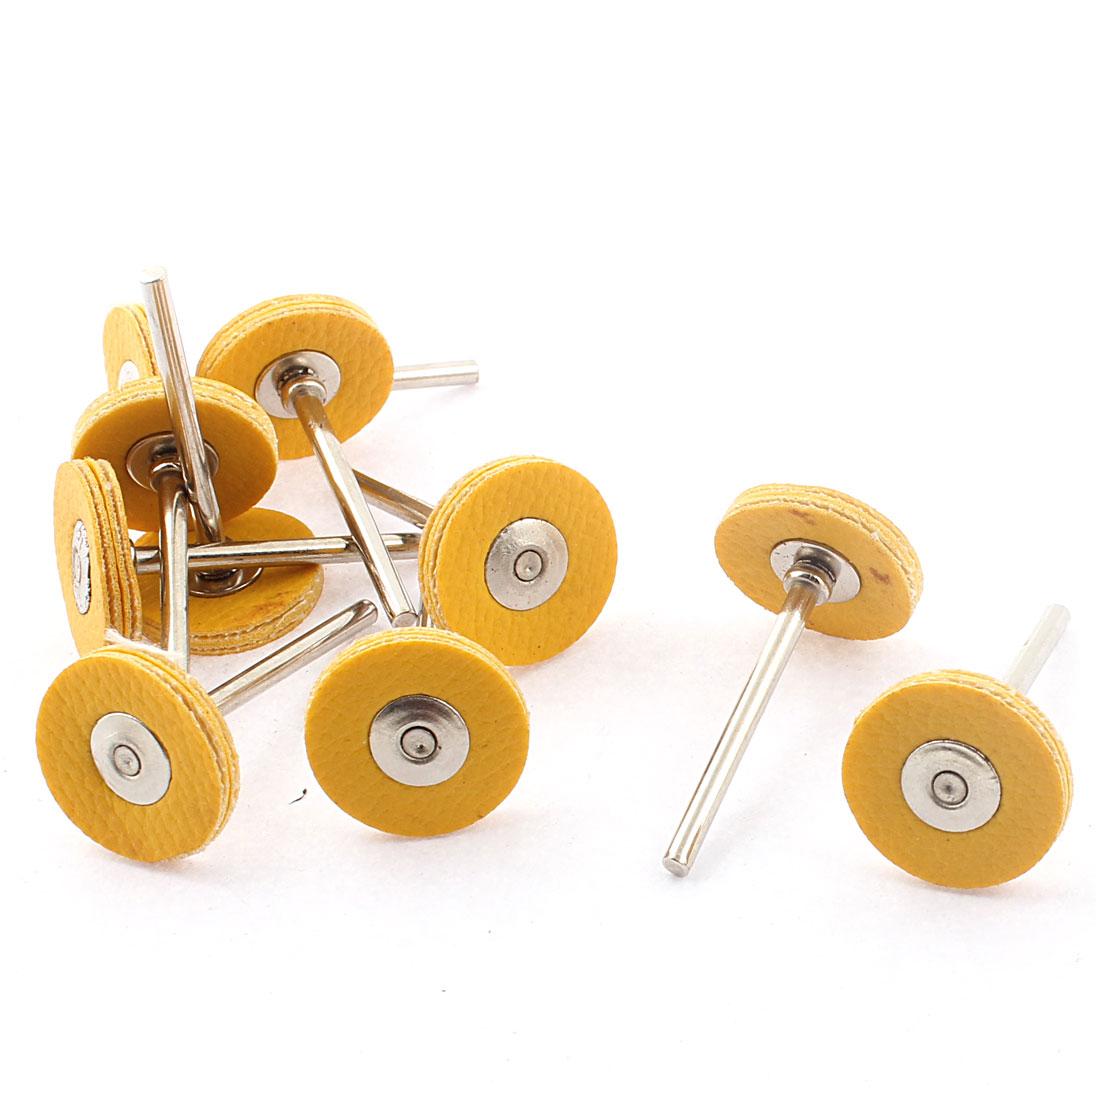 10 Pcs 3mm Round Shank 3x22mm Faux Leather Pad Jewelry Polishing Buffing Wheel